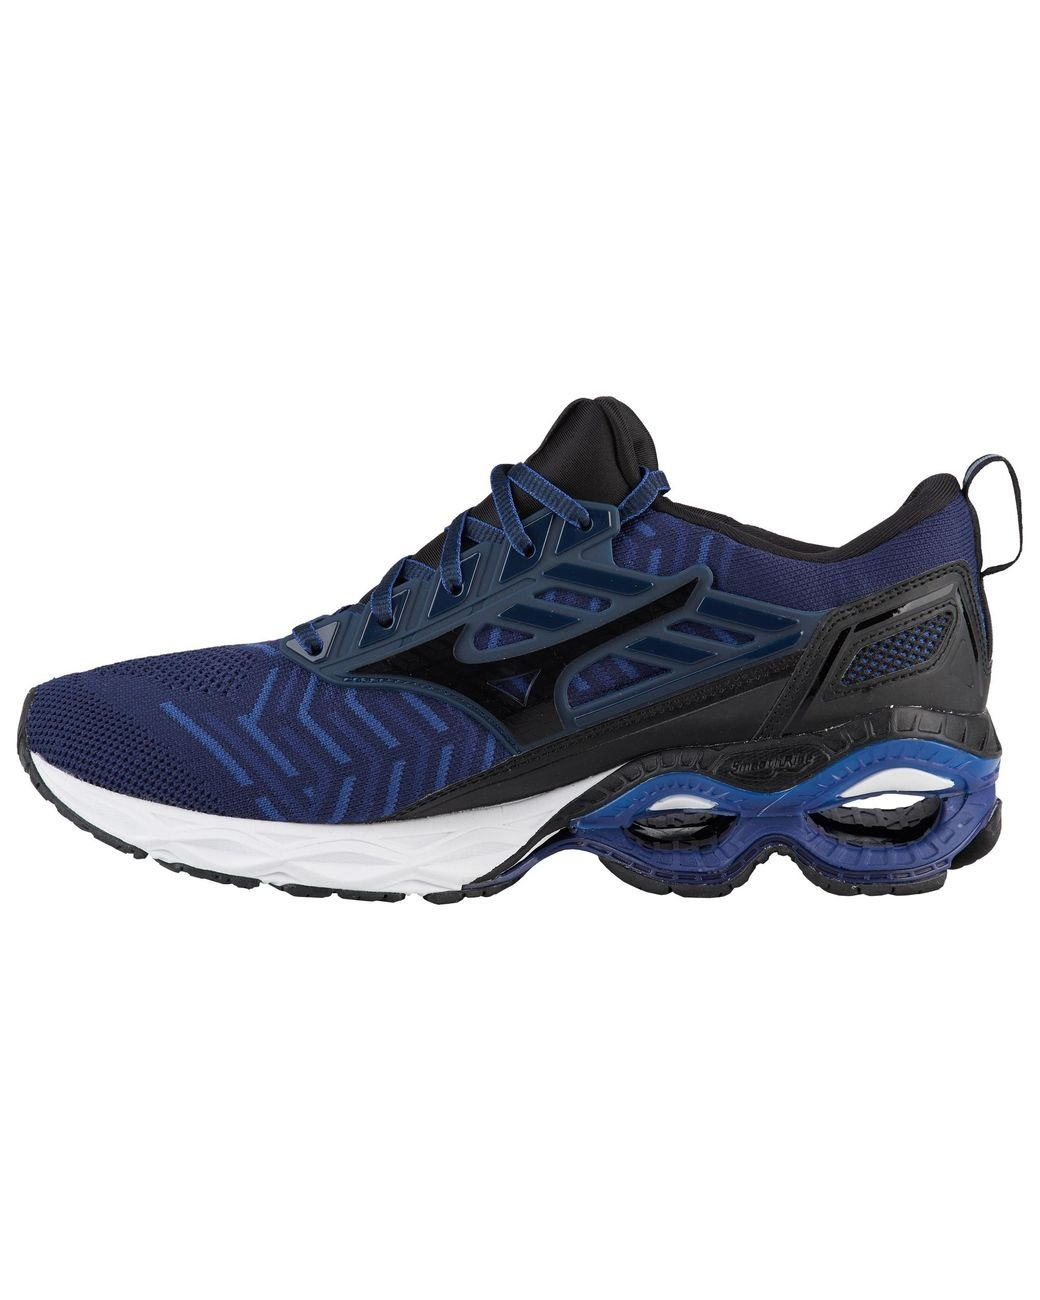 mizuno running shoes nordstrom black